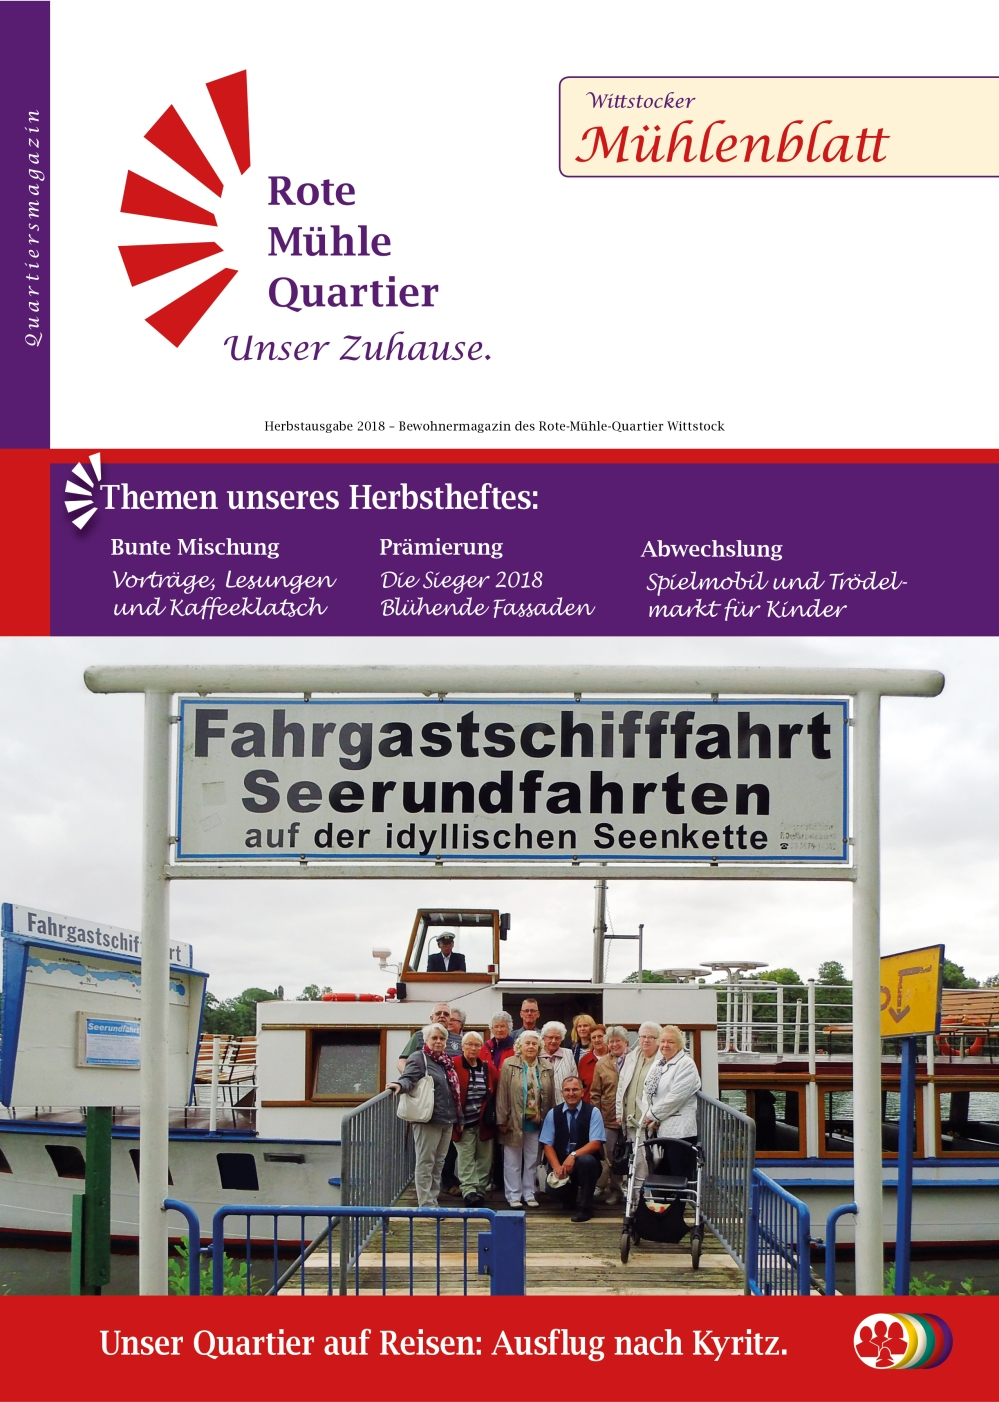 22-Herbst-muehlenblatt_Titel